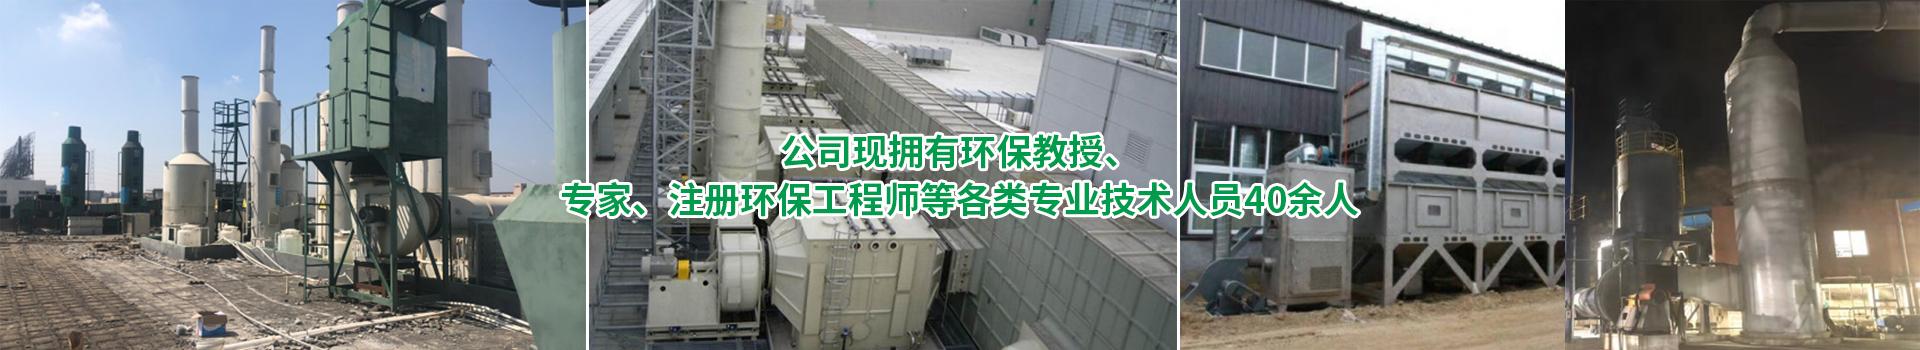 http://www.fulvhuanbao.com/data/upload/201912/20191213110245_772.jpg